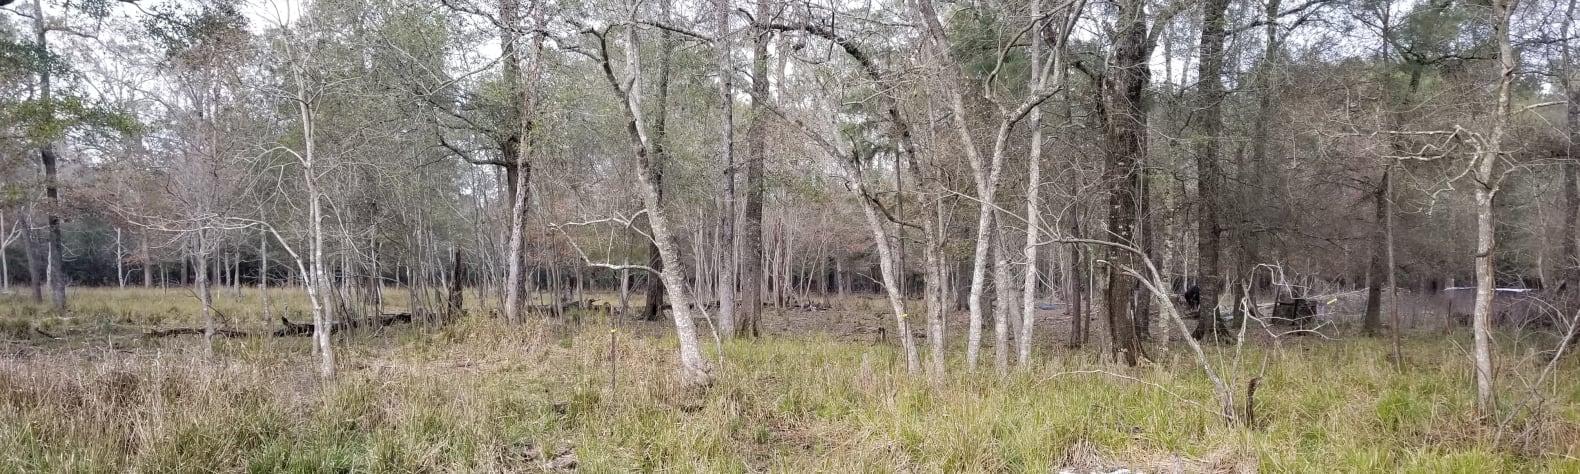 The Happy Campinn Ranch